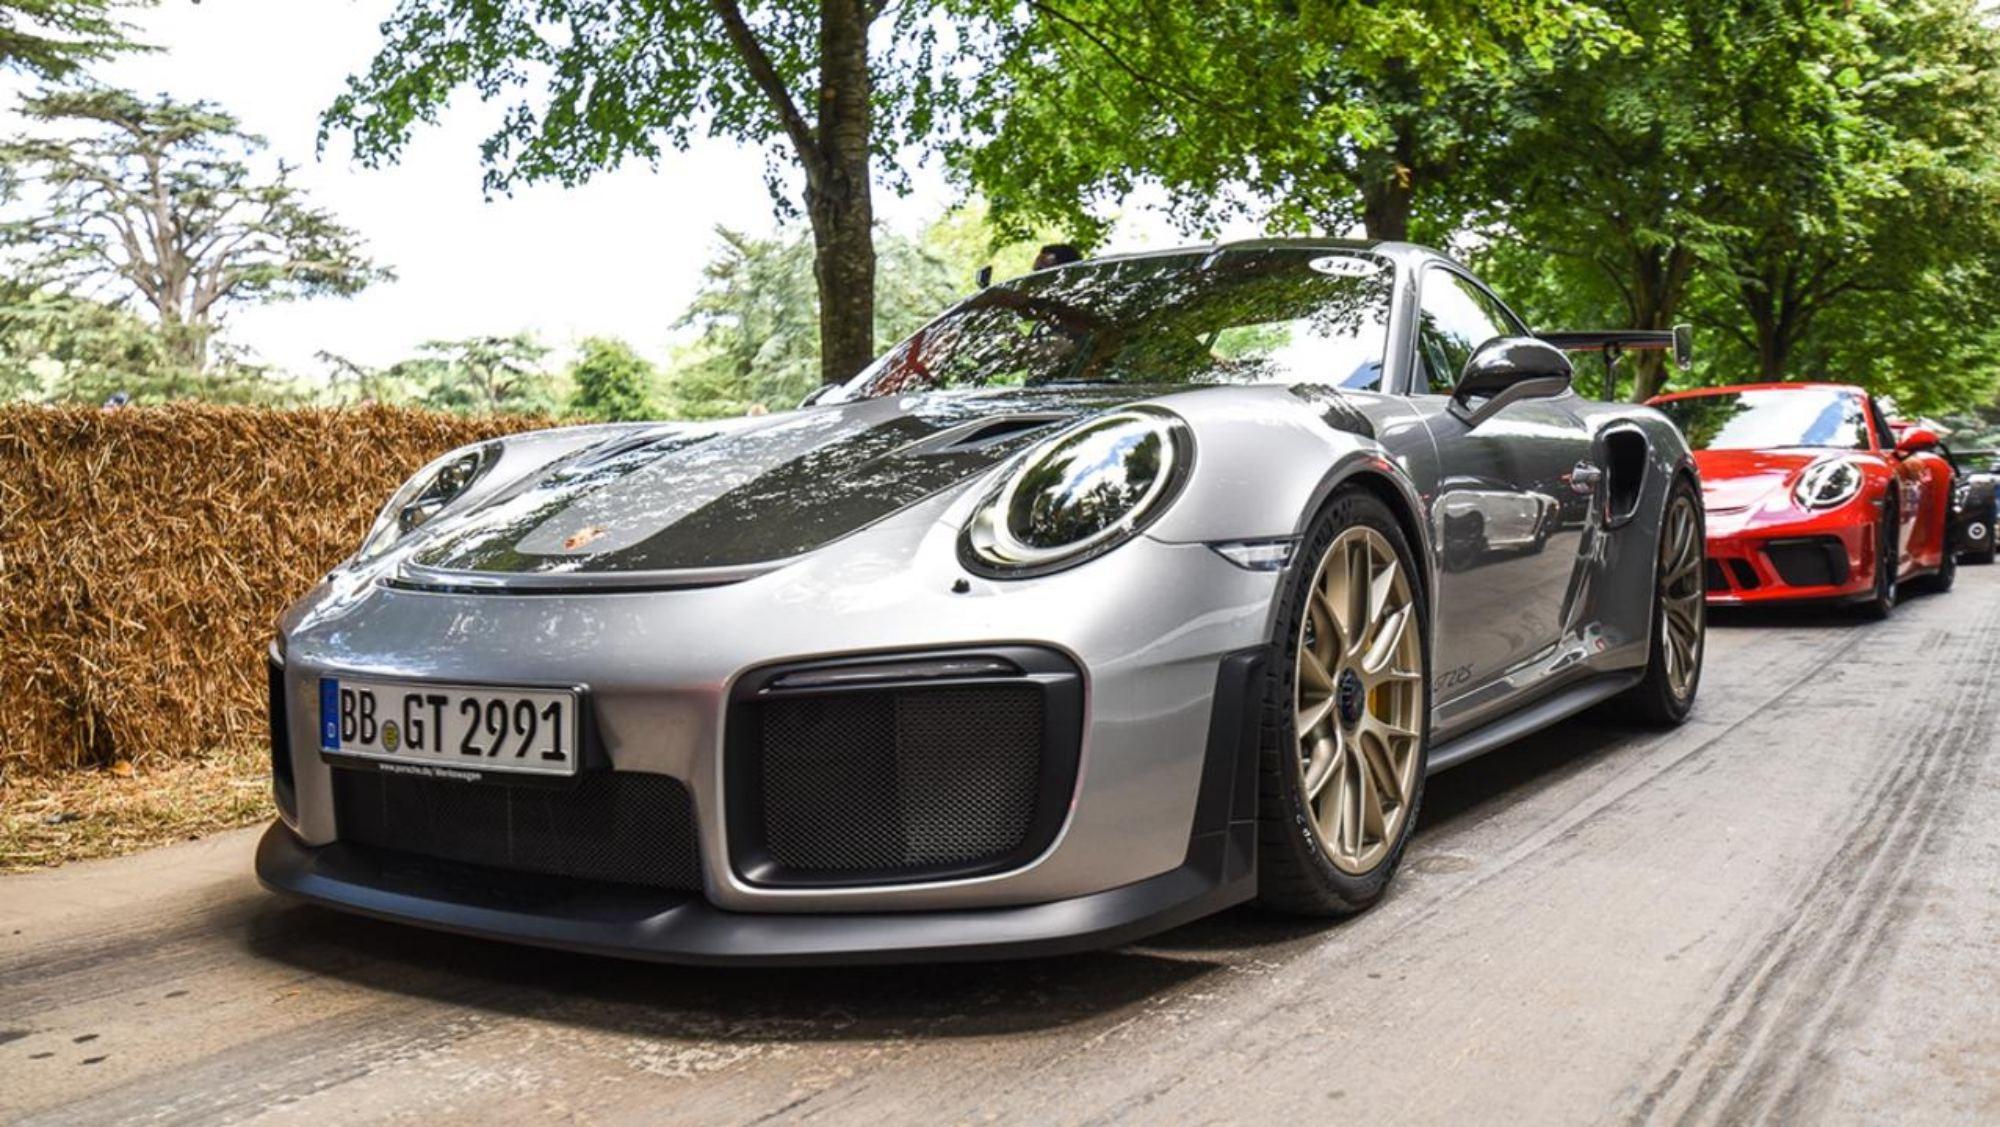 Porsche 911 GT2 RS Gets Full Reveal At Goodwood Thumbnail